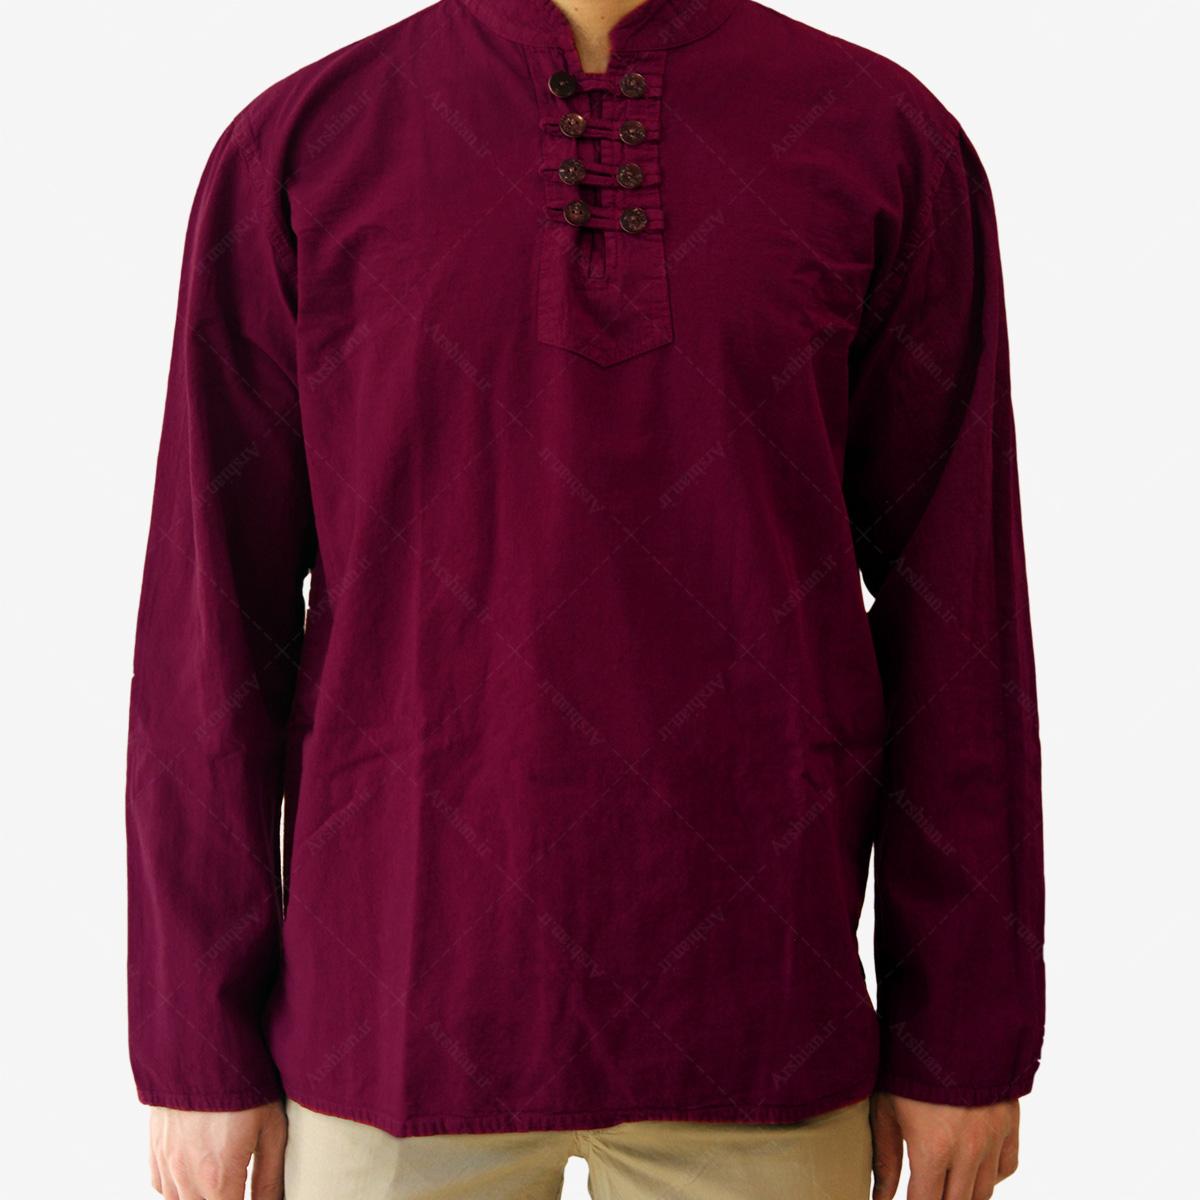 پیراهن الیاف طبیعی طرح هشت دکمه مدل ze001